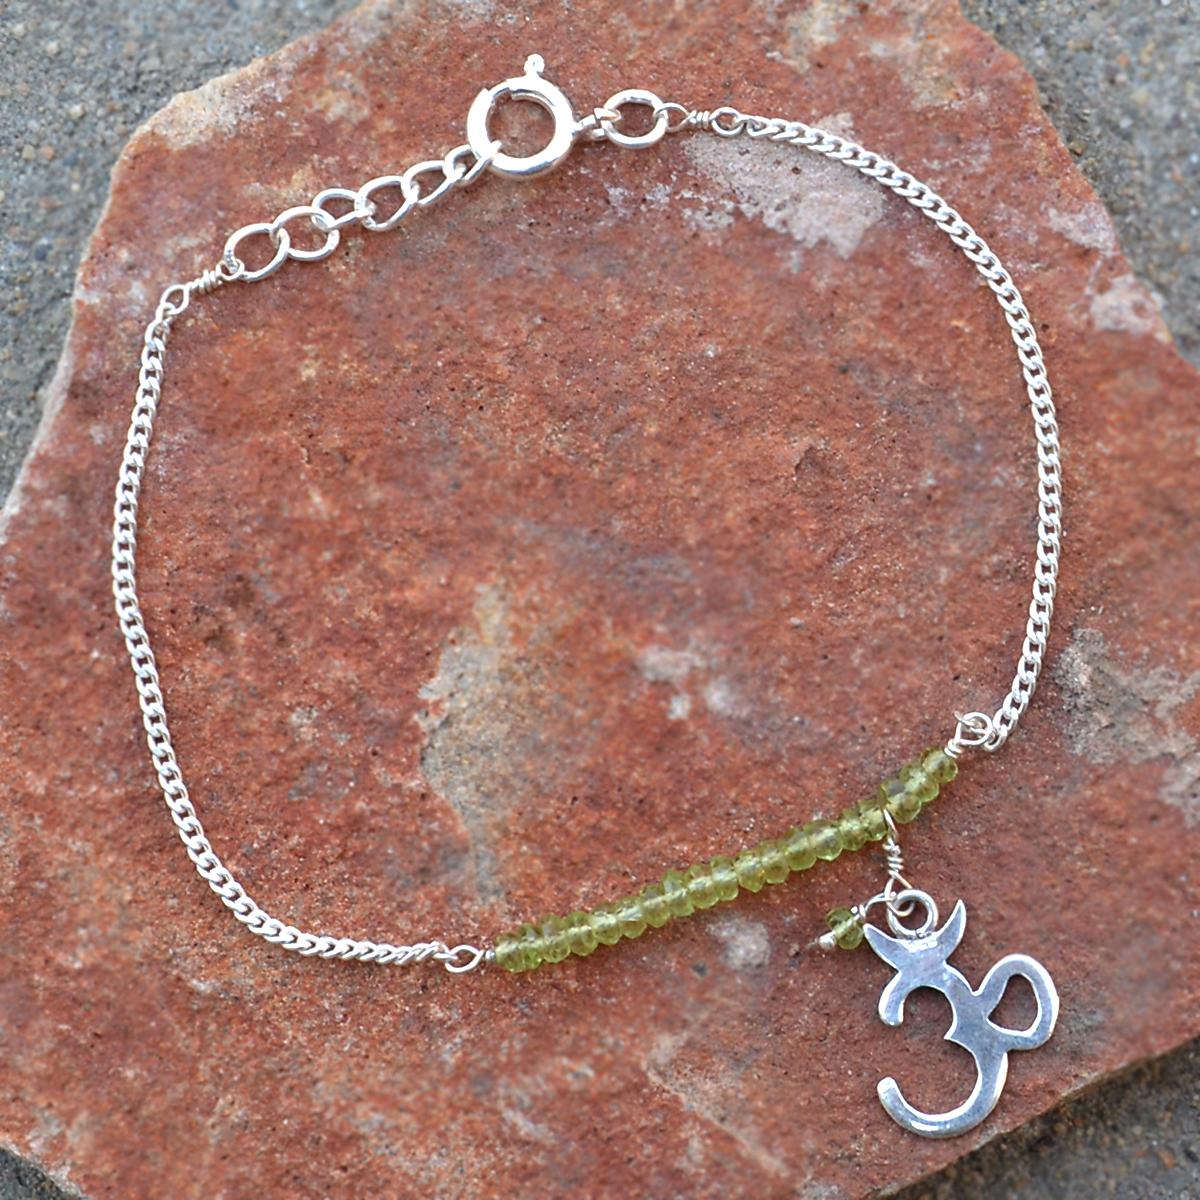 Peridot Gemstone Silver Bracelet PG-155893